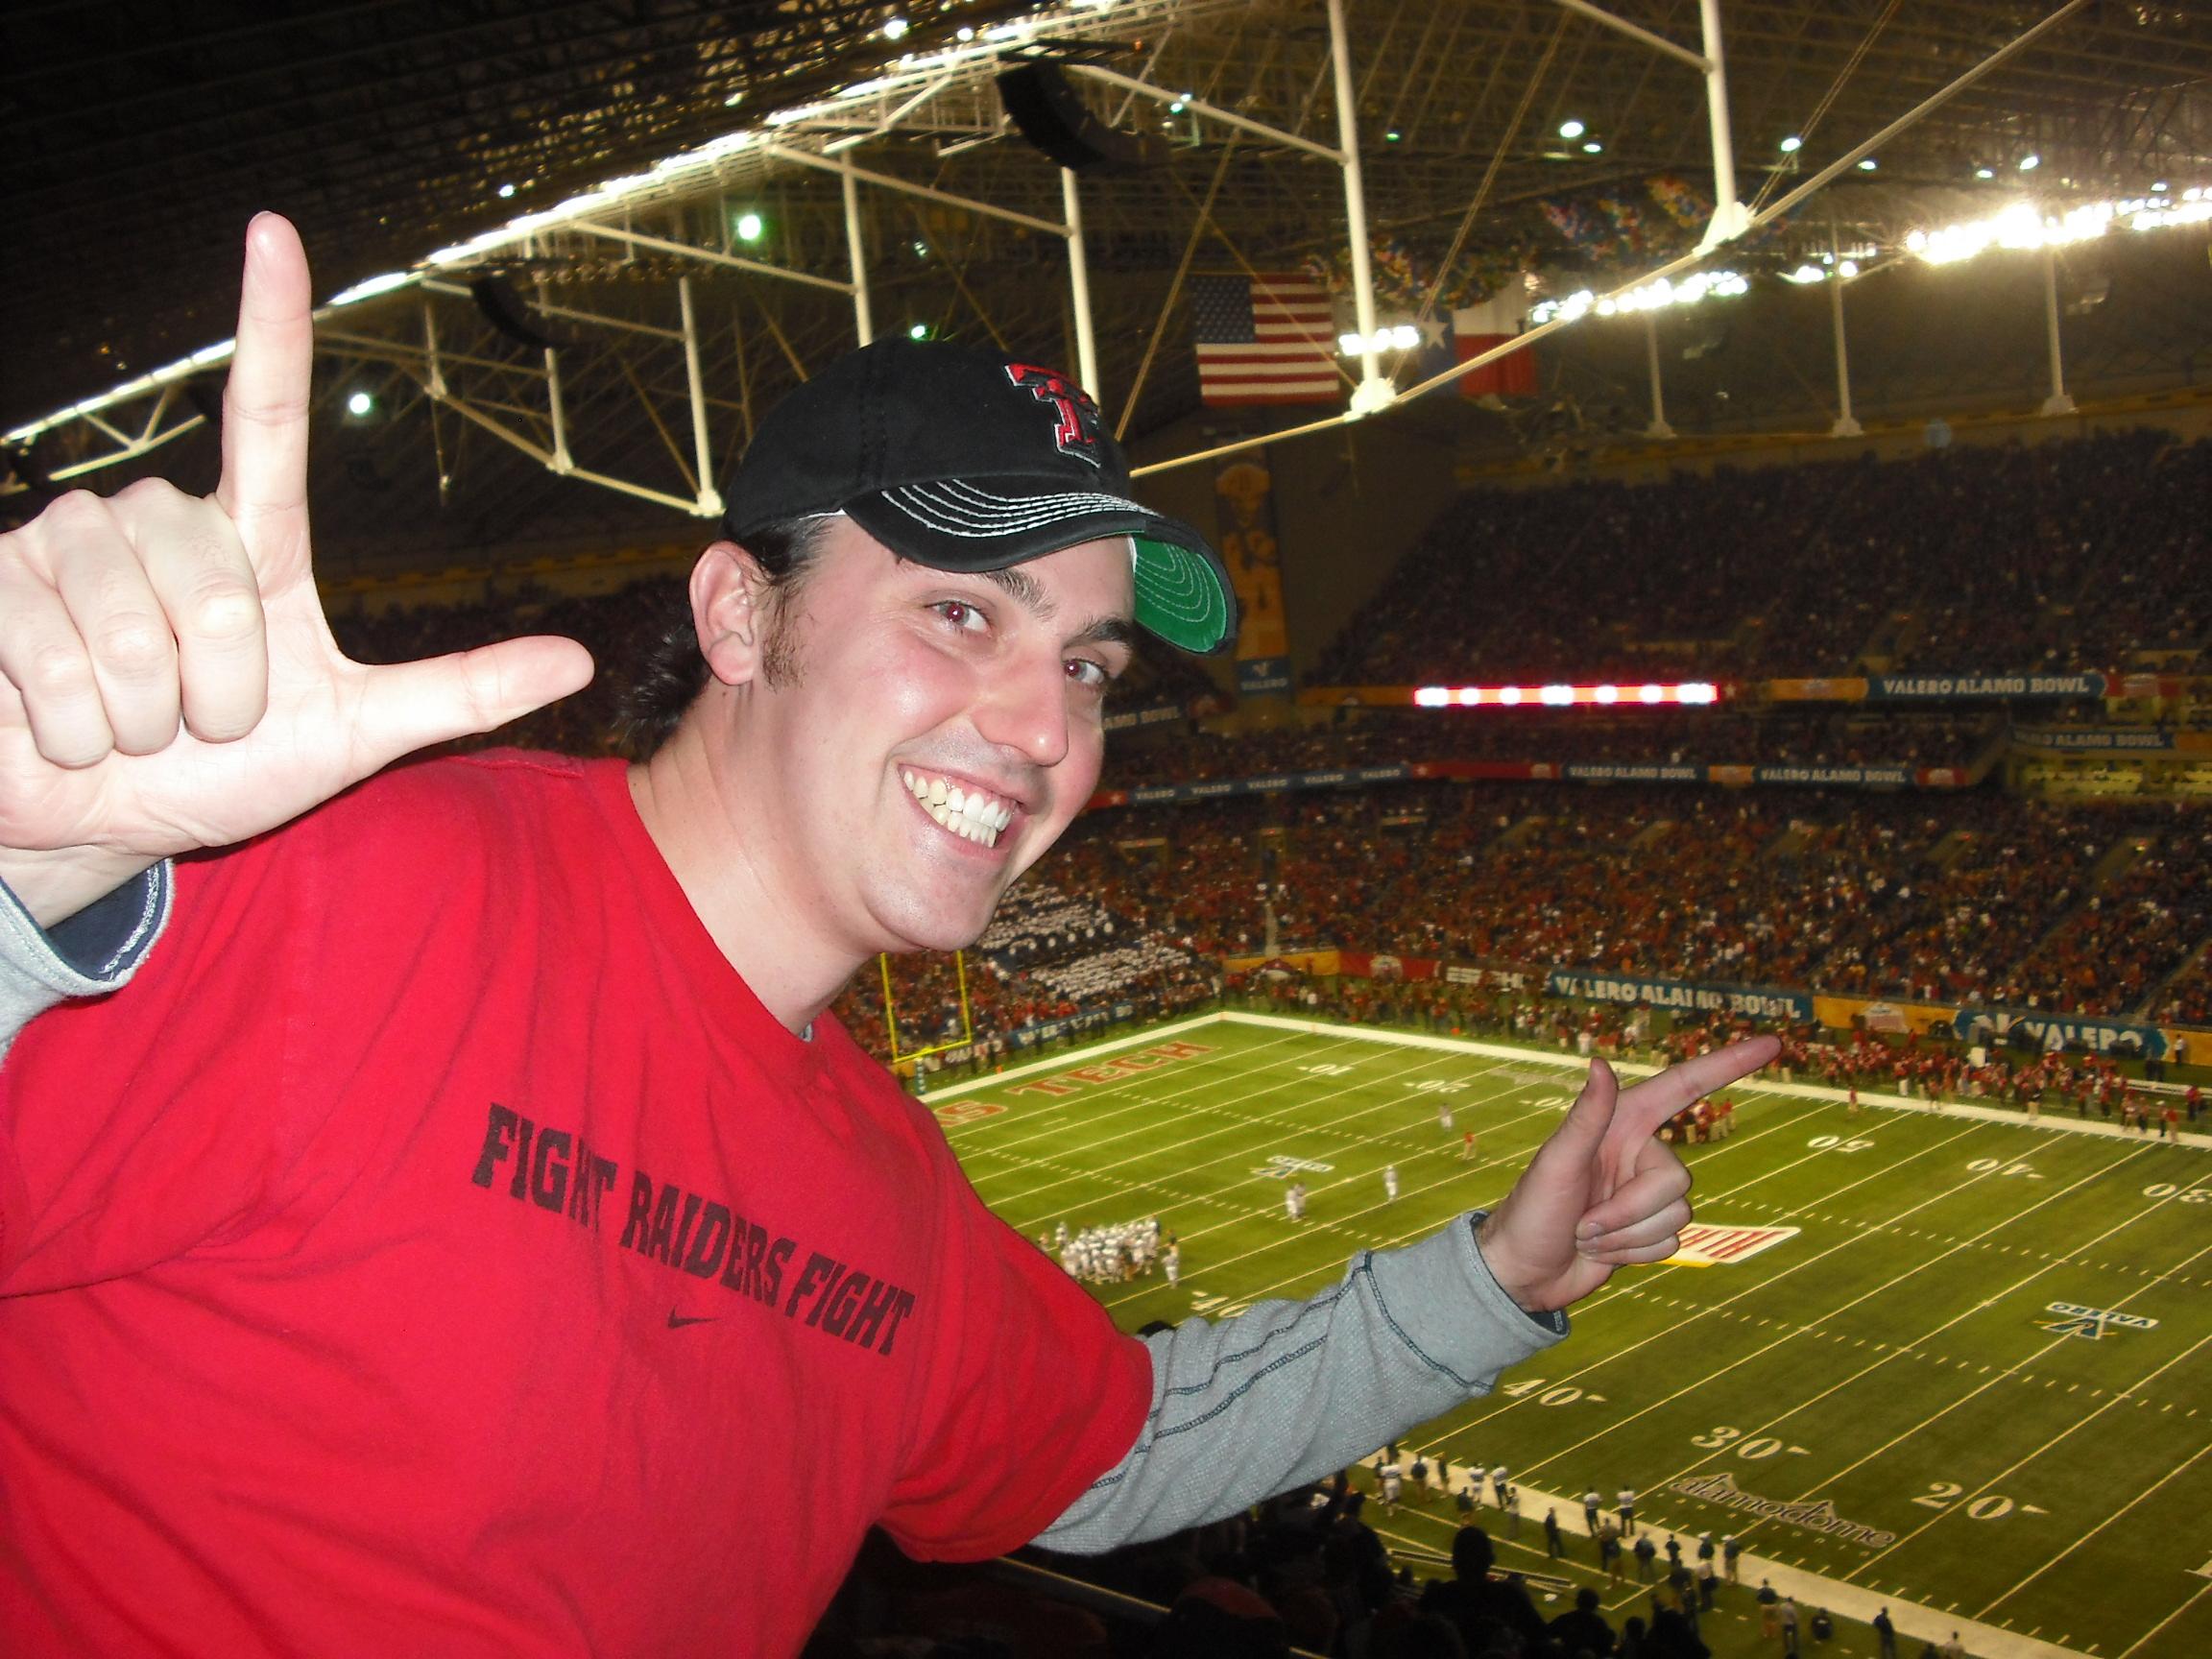 When Texas Tech played in the 2010 Alamo Bowl. Yes, I am a Red Raider. Photo courtesy of Garrett Heath.